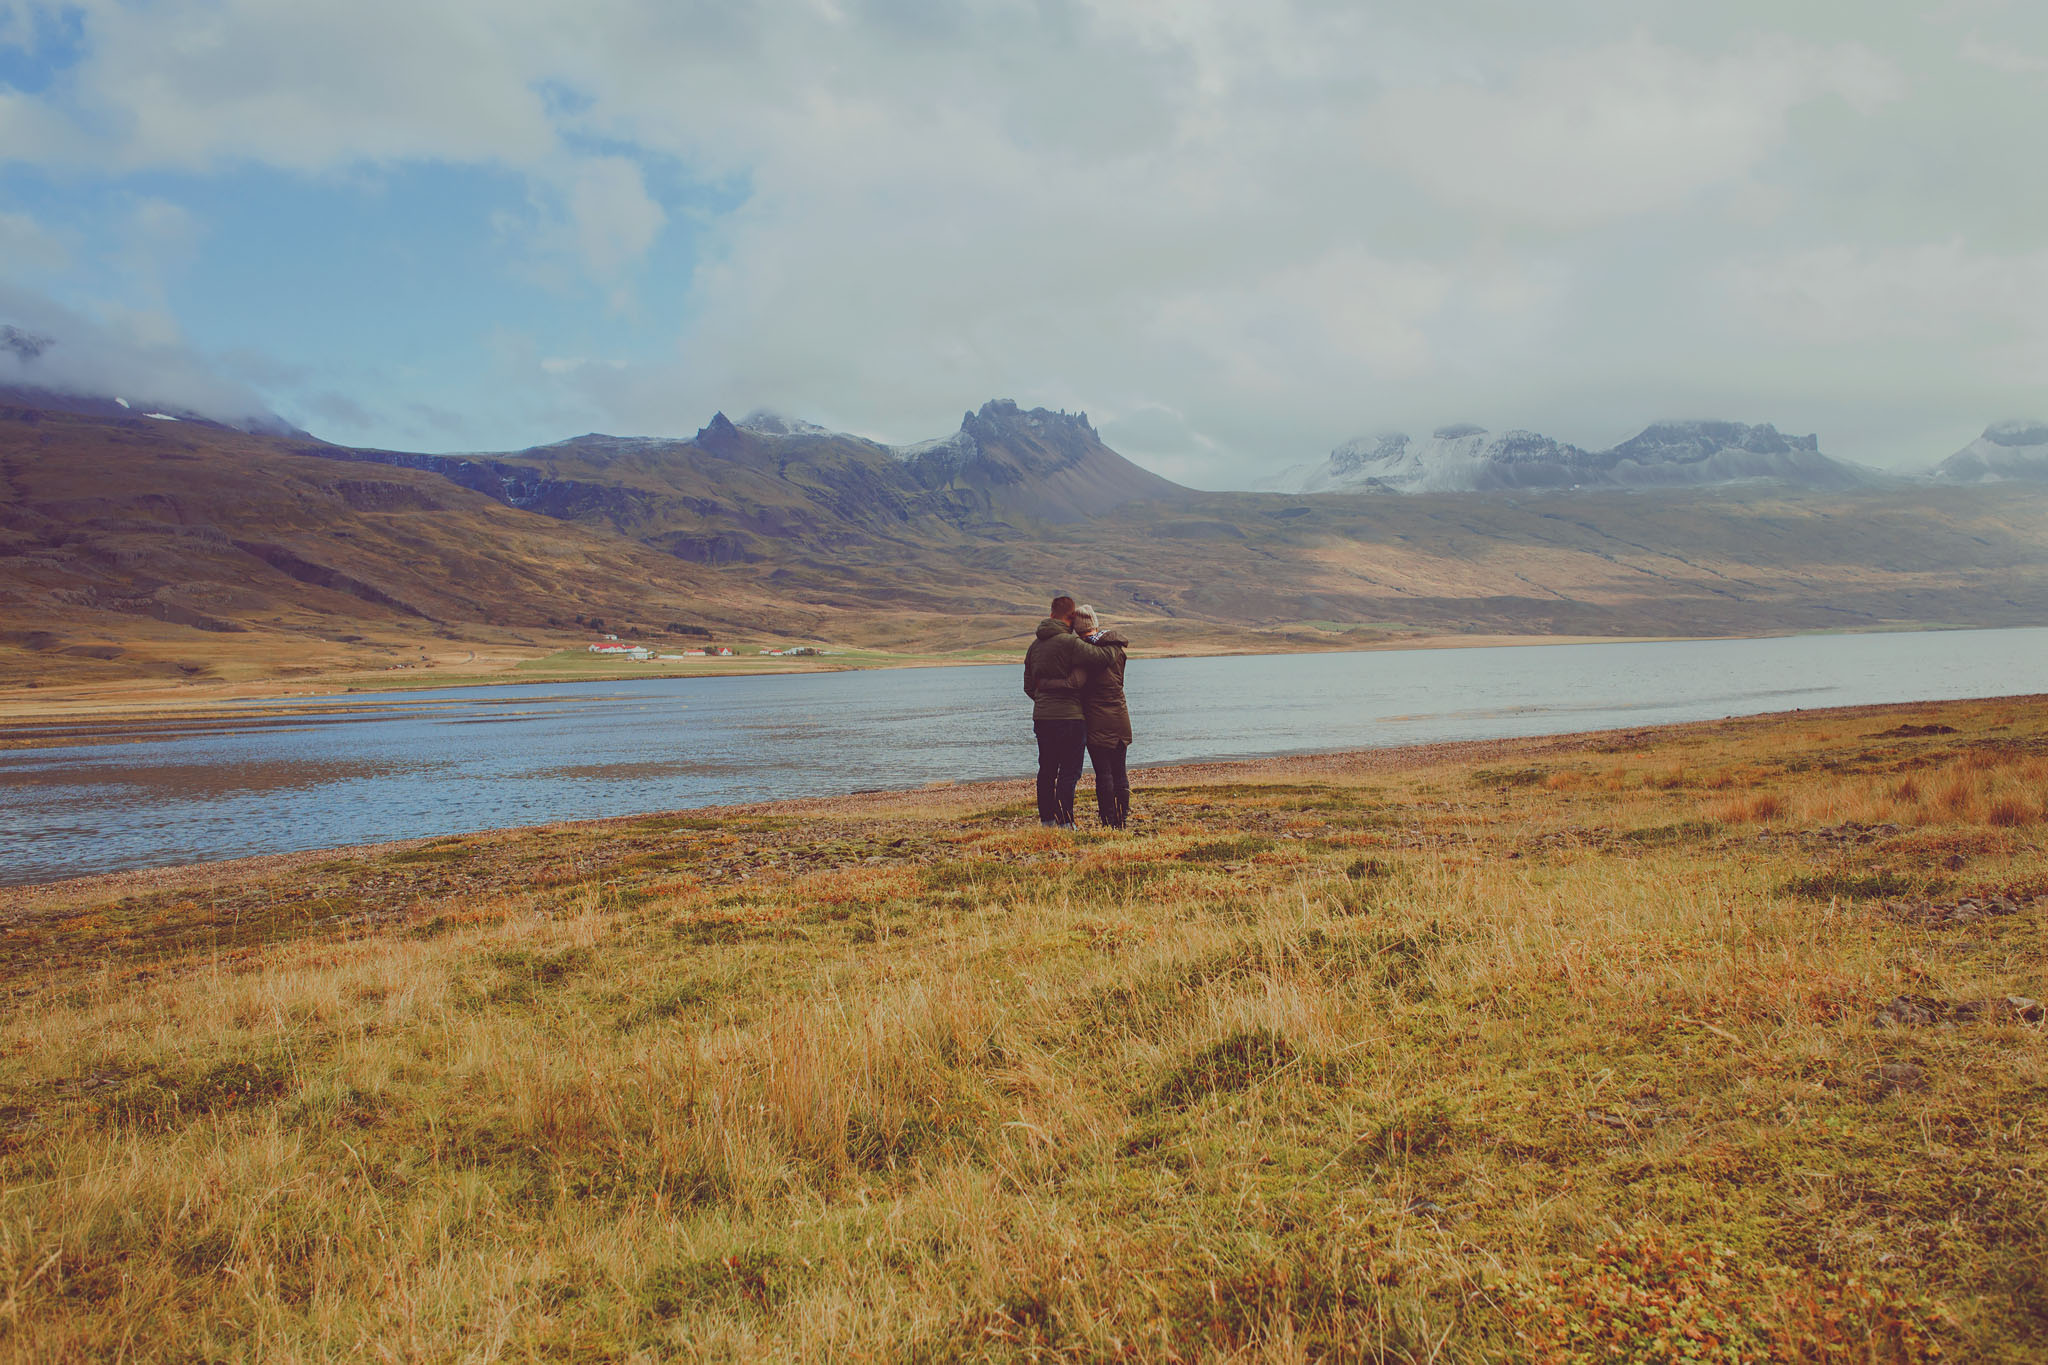 iceland, jennifer picard photography, travel photography